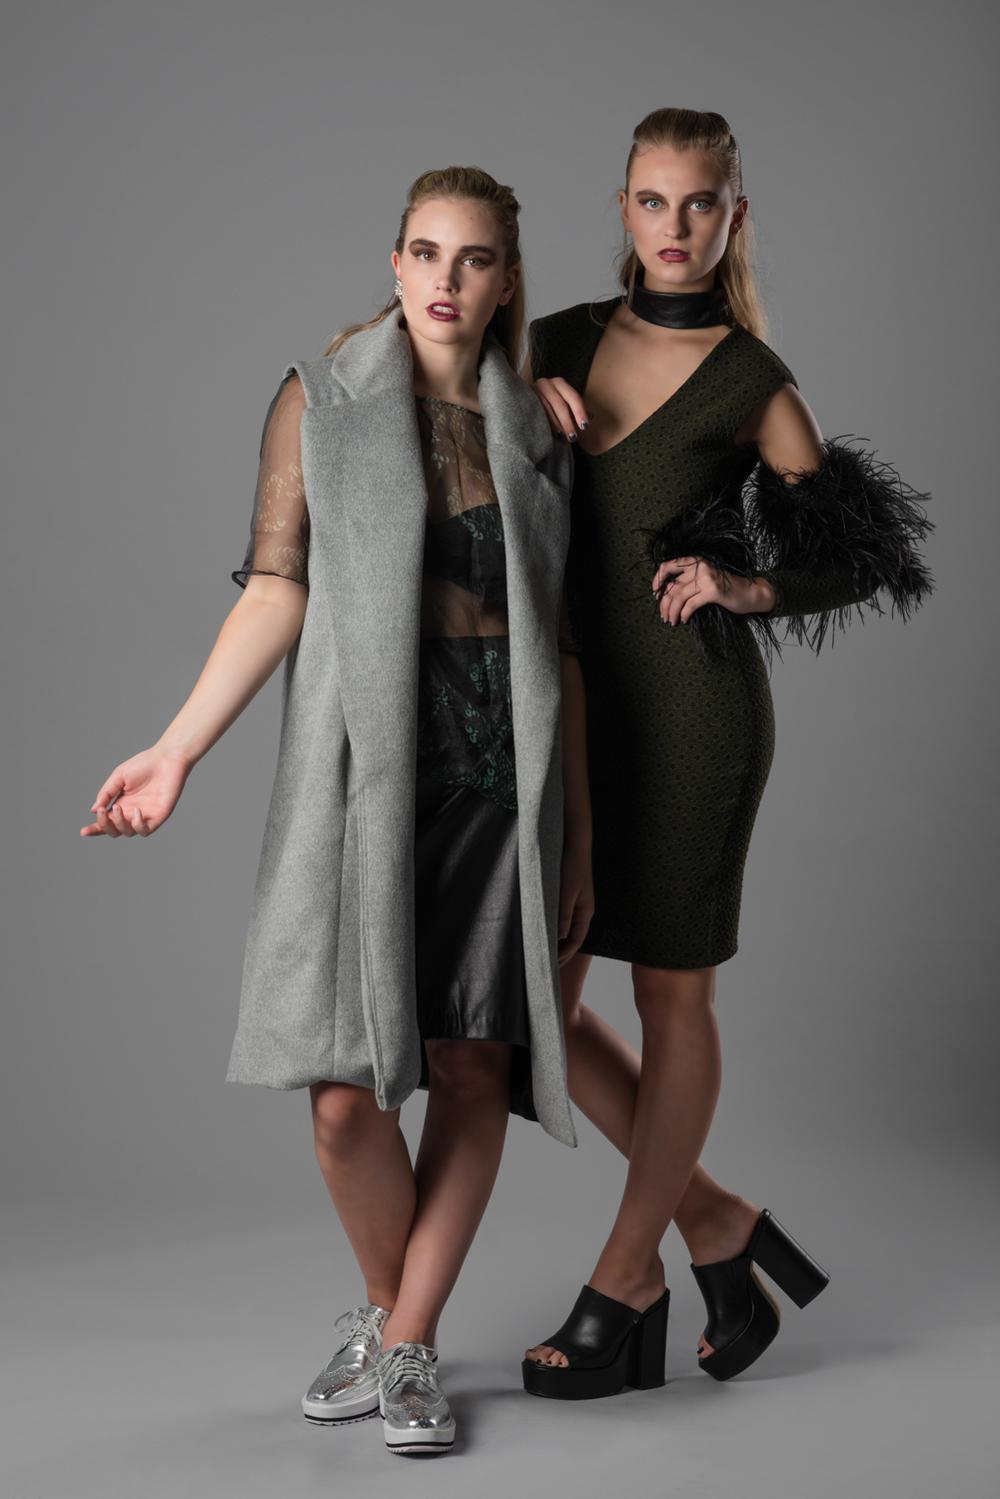 MaxKruseCreative-1Em Nolan fashion-837-Edit-2.jpg